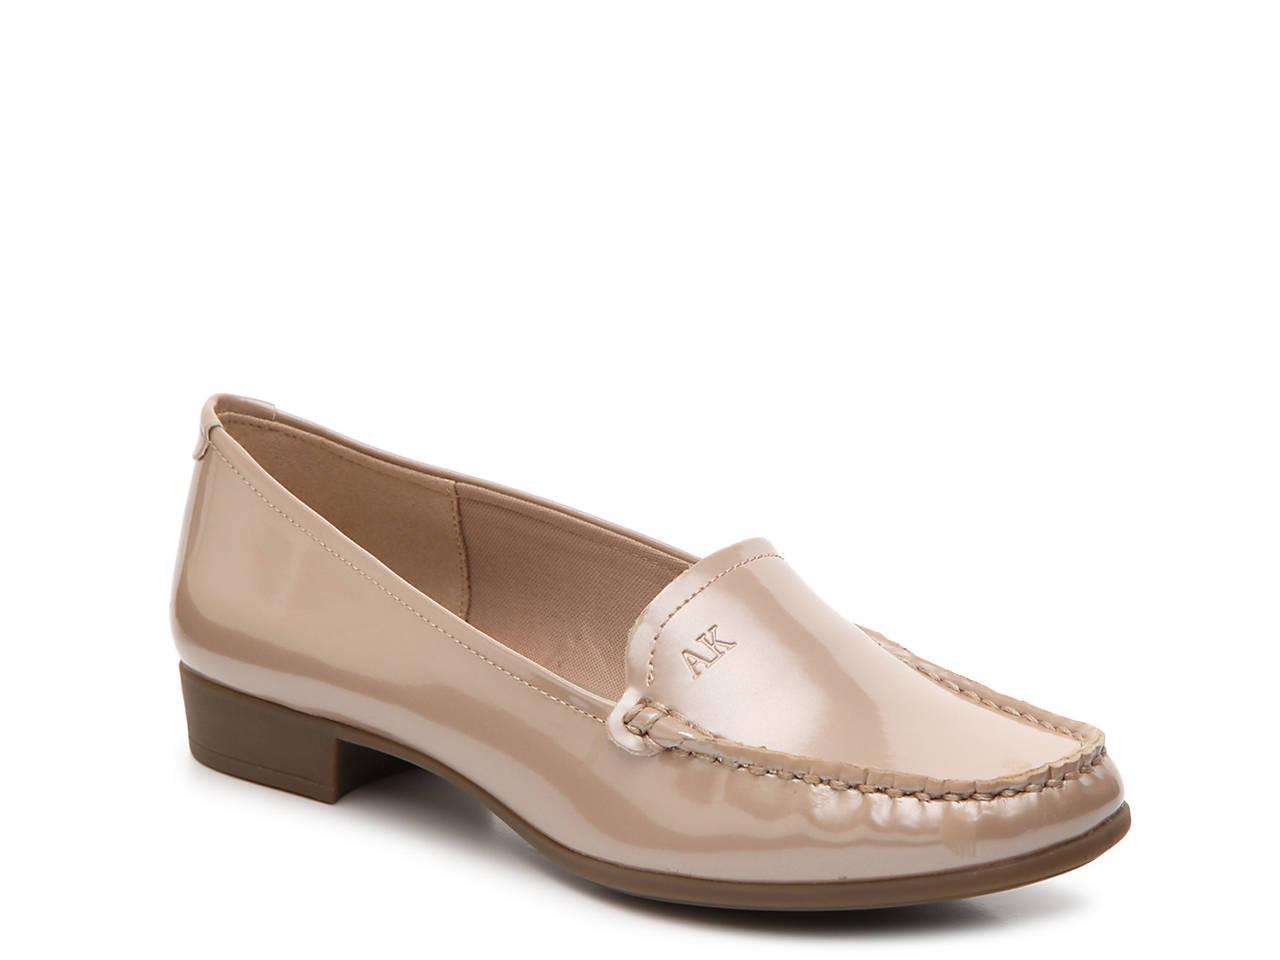 8f884a17394 Anne Klein Vama Loafer Women s Shoes